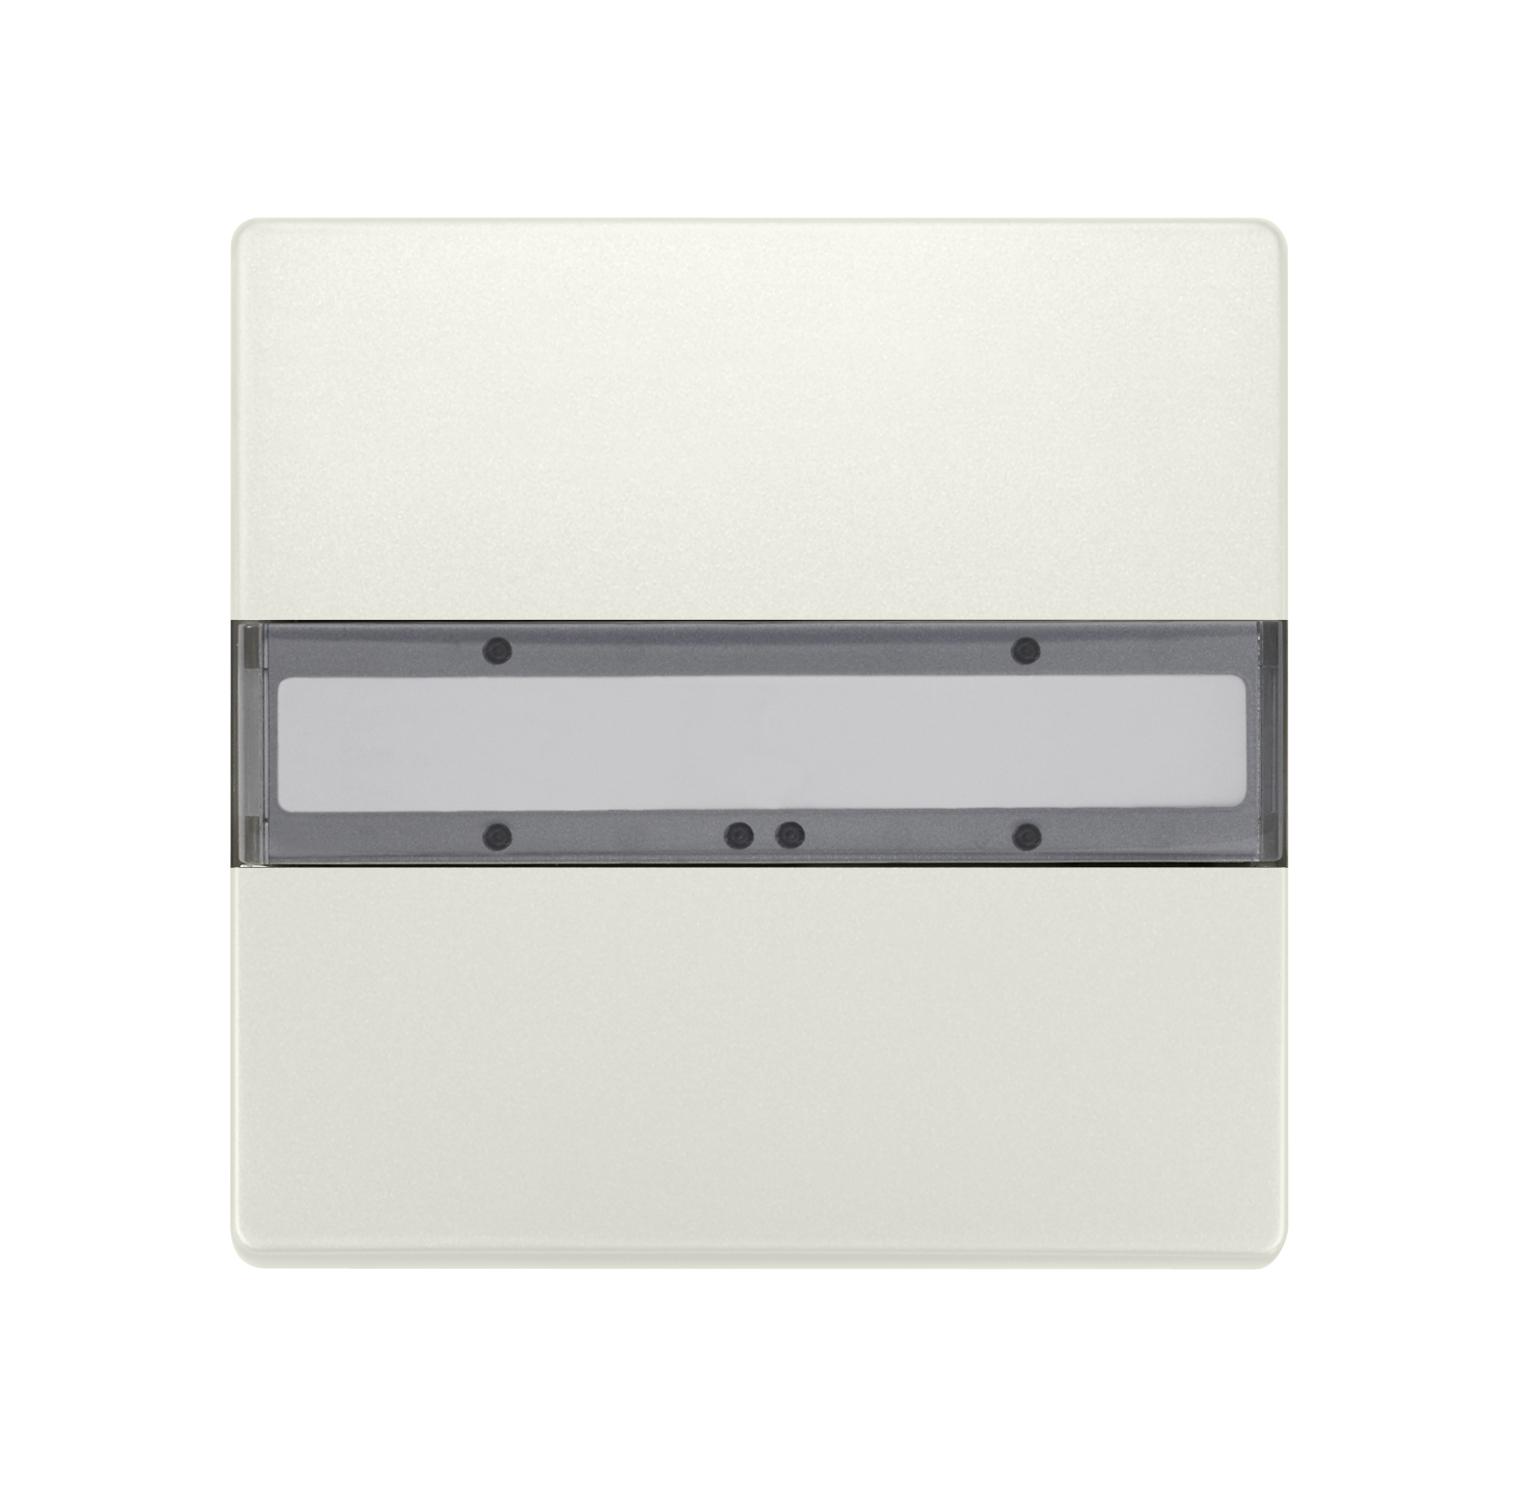 1 Stk Taster 1-fach ohne Status-LED, DELTA style, titanweiß KX2852DB12